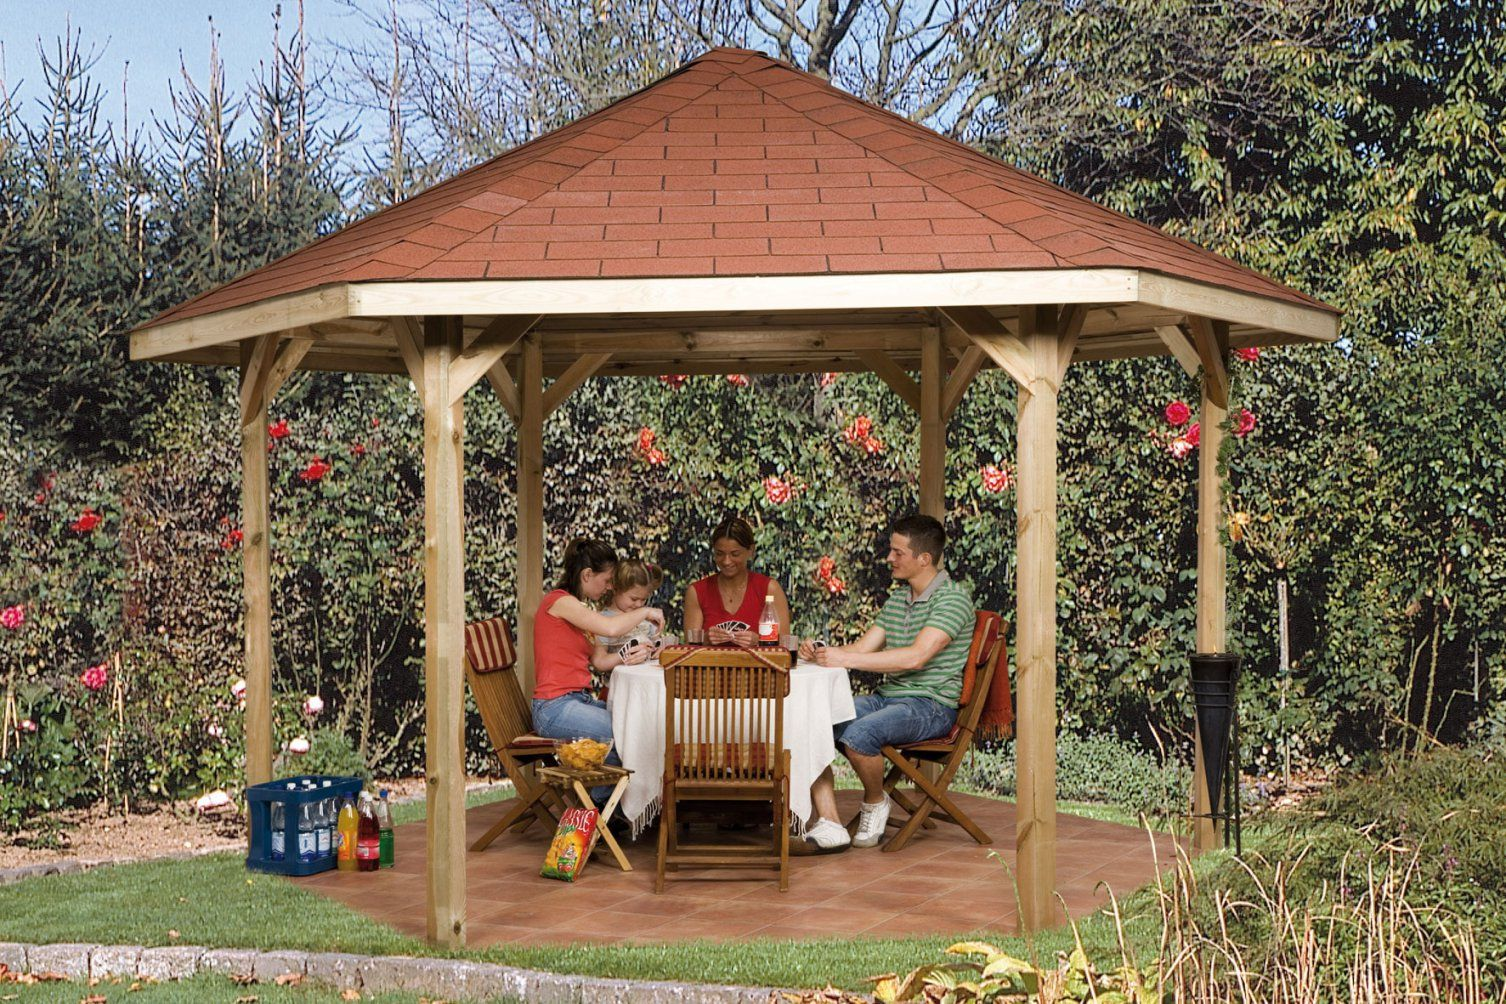 Weka Gartenlaube 656 Gr2 Pavillon Kdi 399X461Cm  Bei Edingershops von Pavillon 6 Eckig Holz Photo